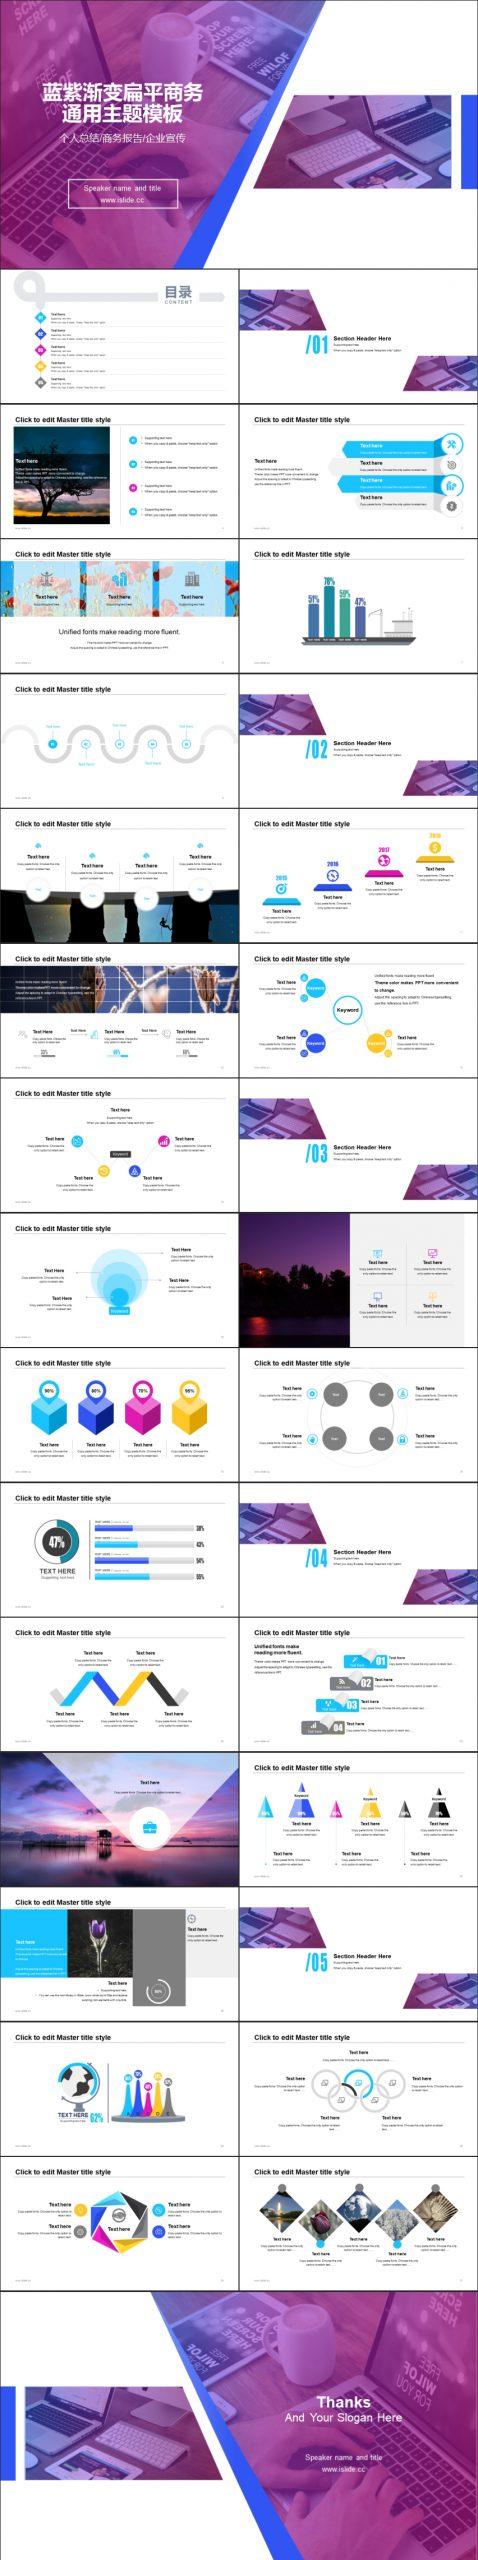 iSlide蓝紫渐变扁平商务工作规划PPT模板下载_预览图2